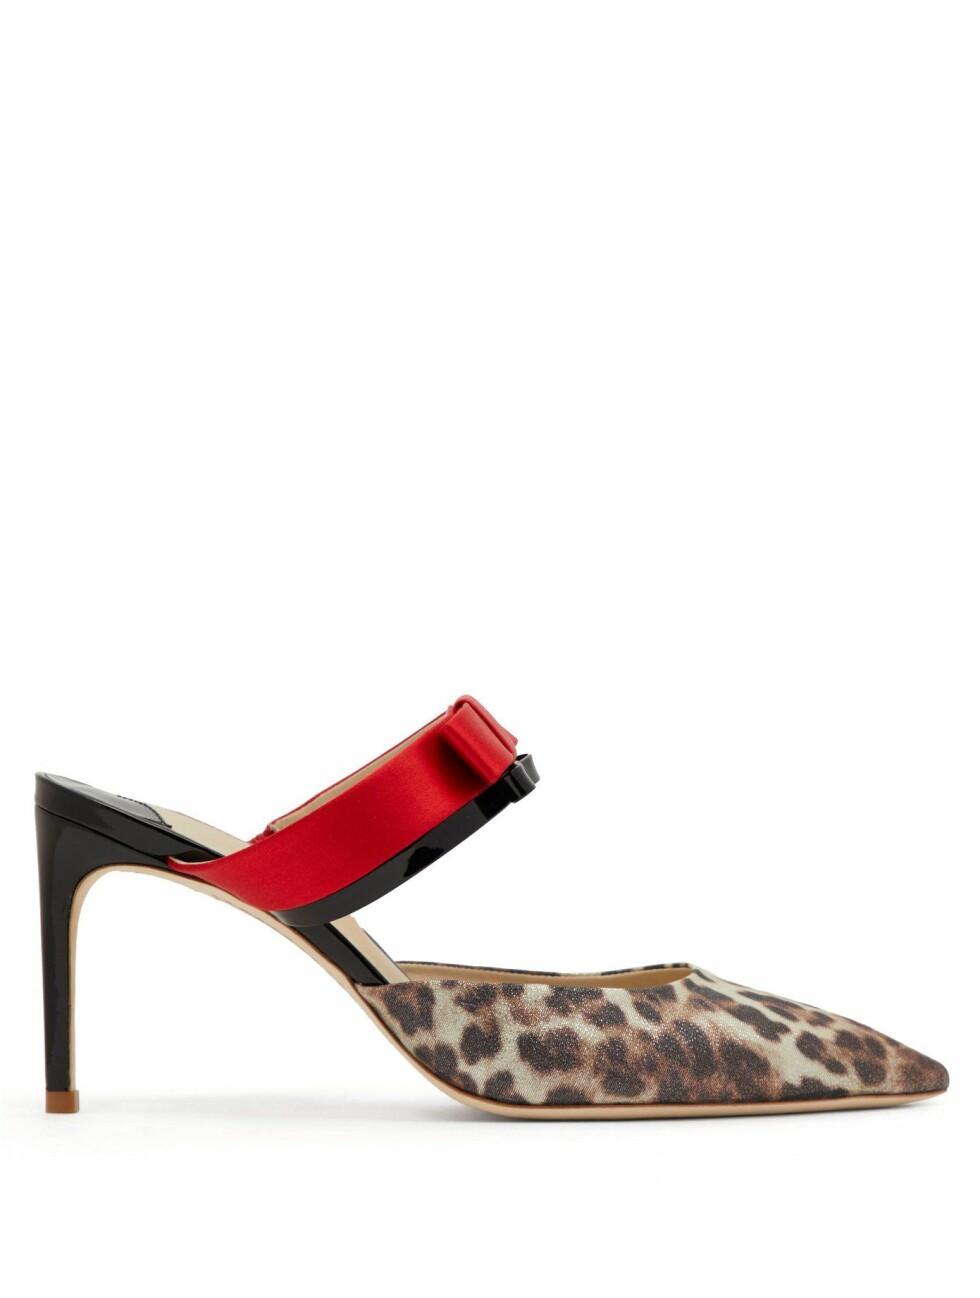 Sko fra Sophia Webster |3345,-| https://www.matchesfashion.com/intl/products/Sophia-Webster-Andie-bow-trim-leopard-print-lurex-mules-1237257